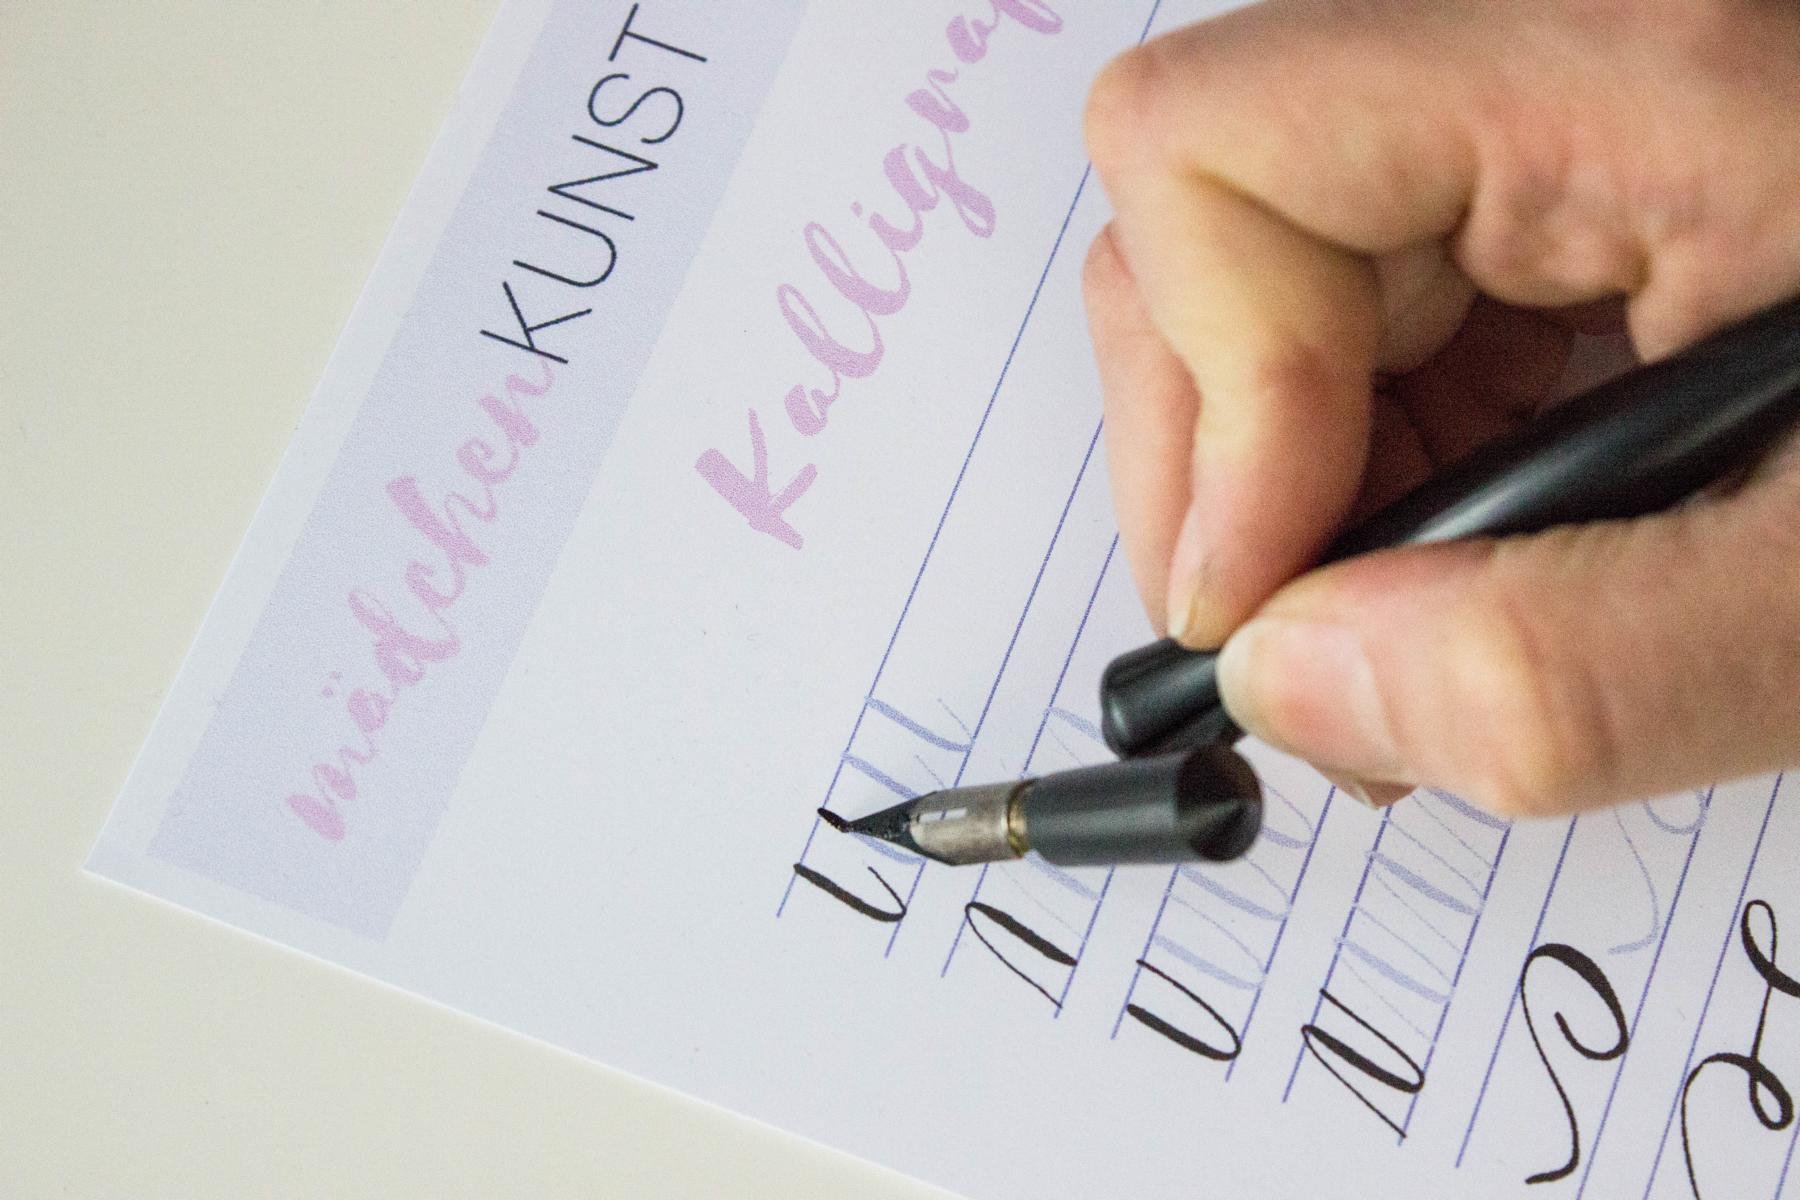 k1600_kalligrafie-uebungsblatt-2-of-5